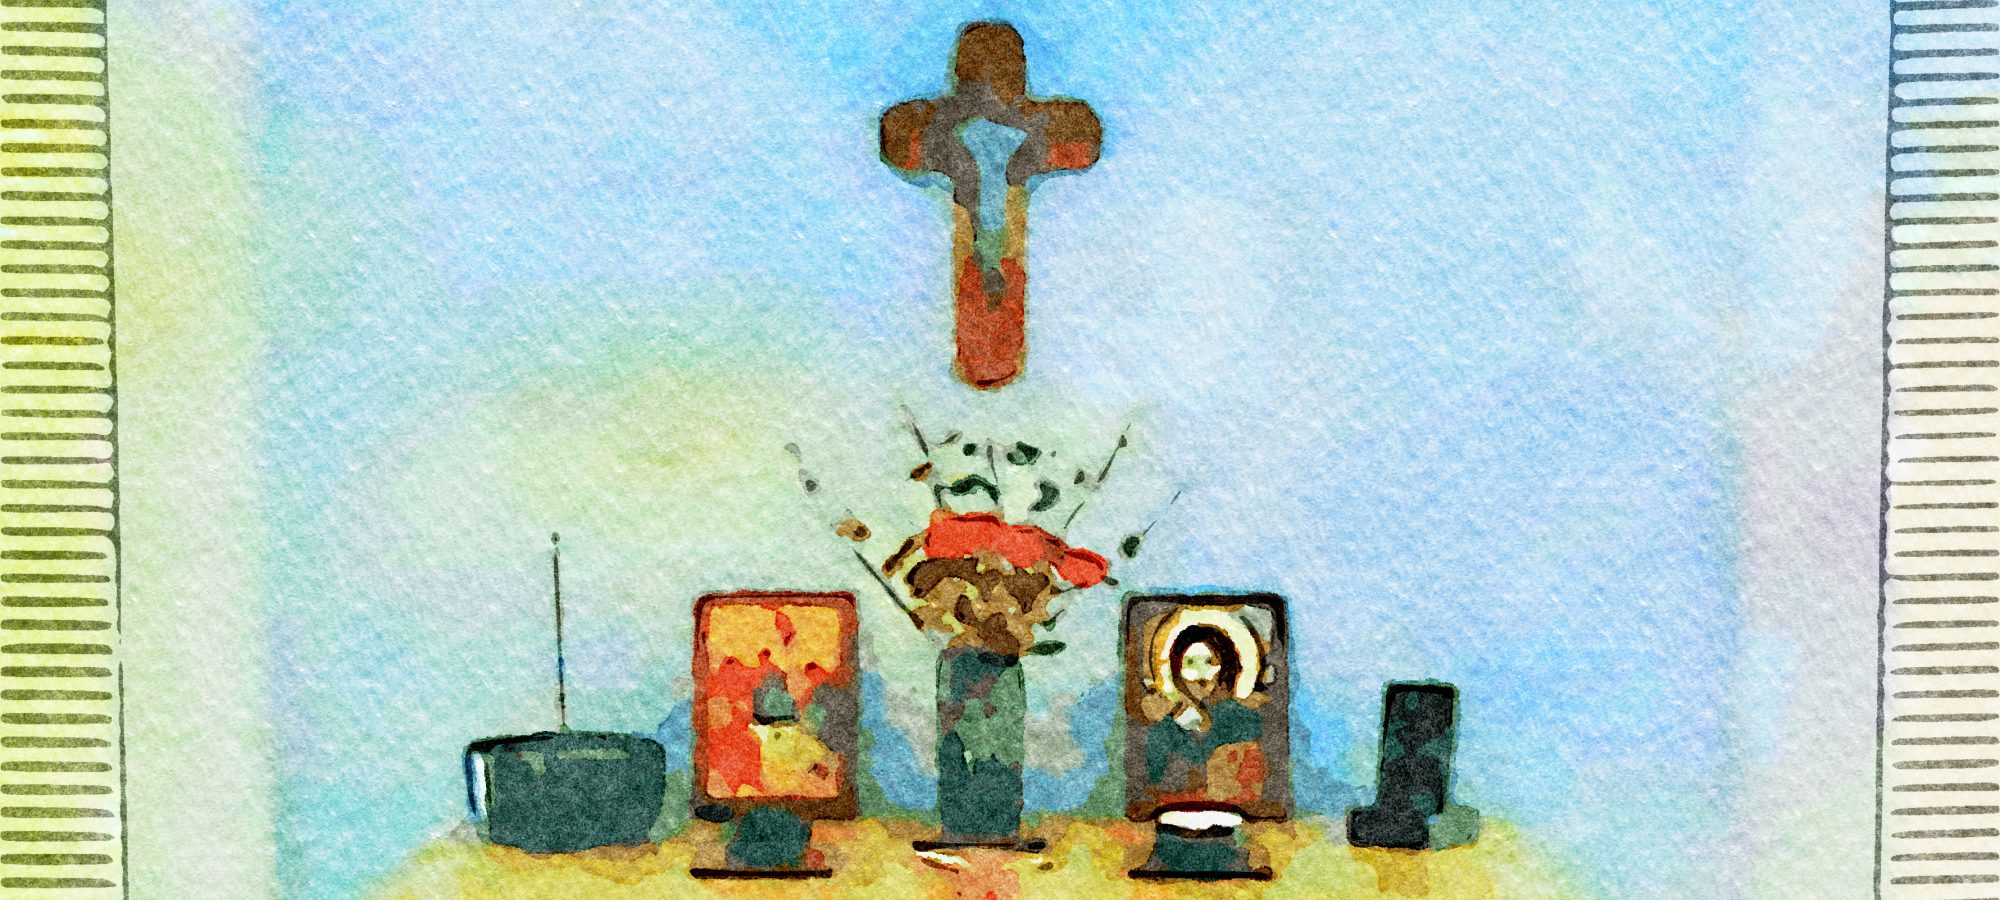 Seeking God's face together